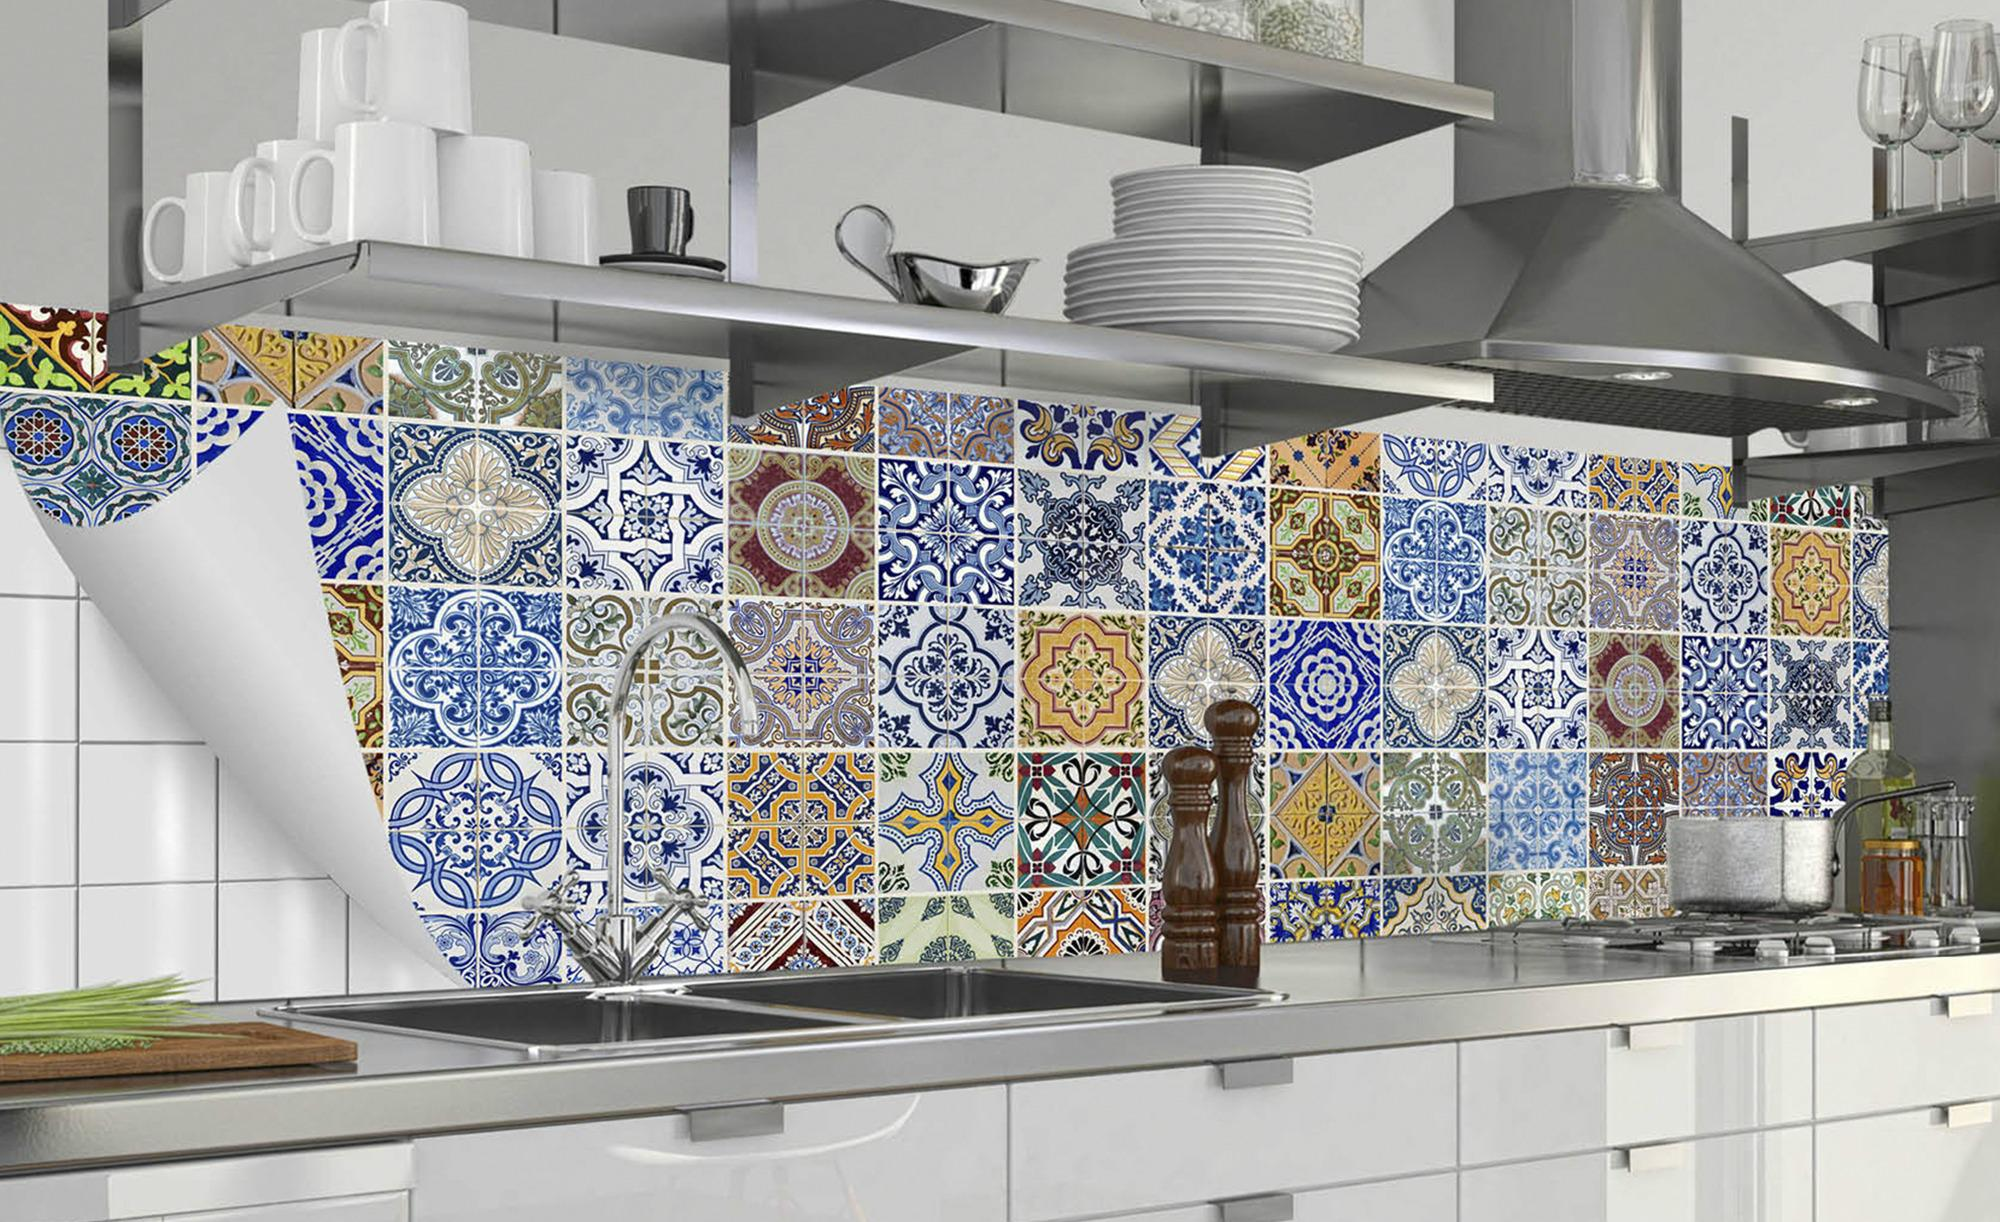 Küchenrückwand-Folie Fixy Pablo Fliese - Sconto